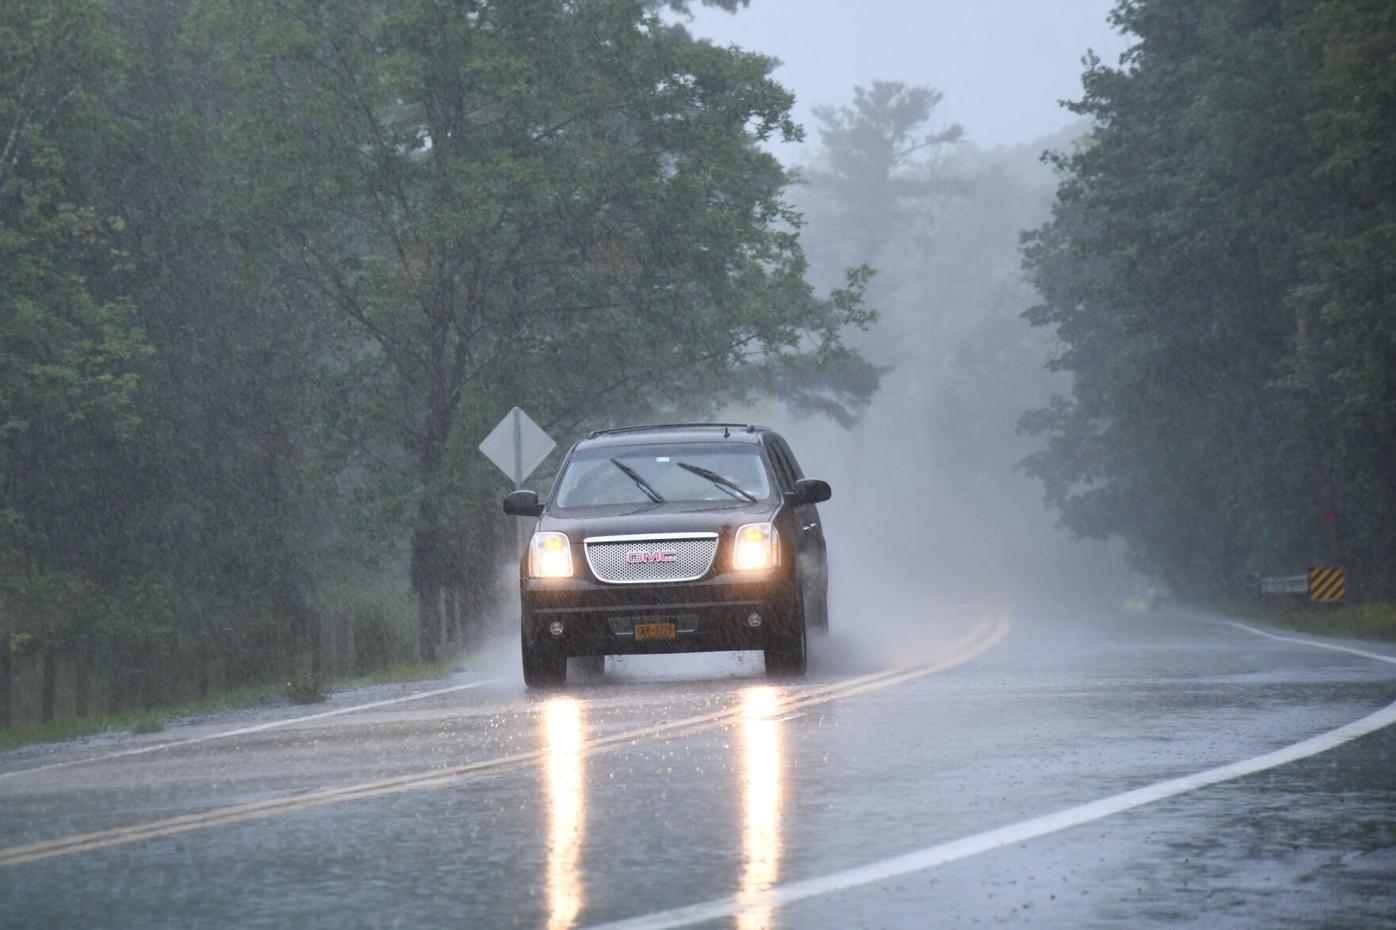 An SUV navigates the storm